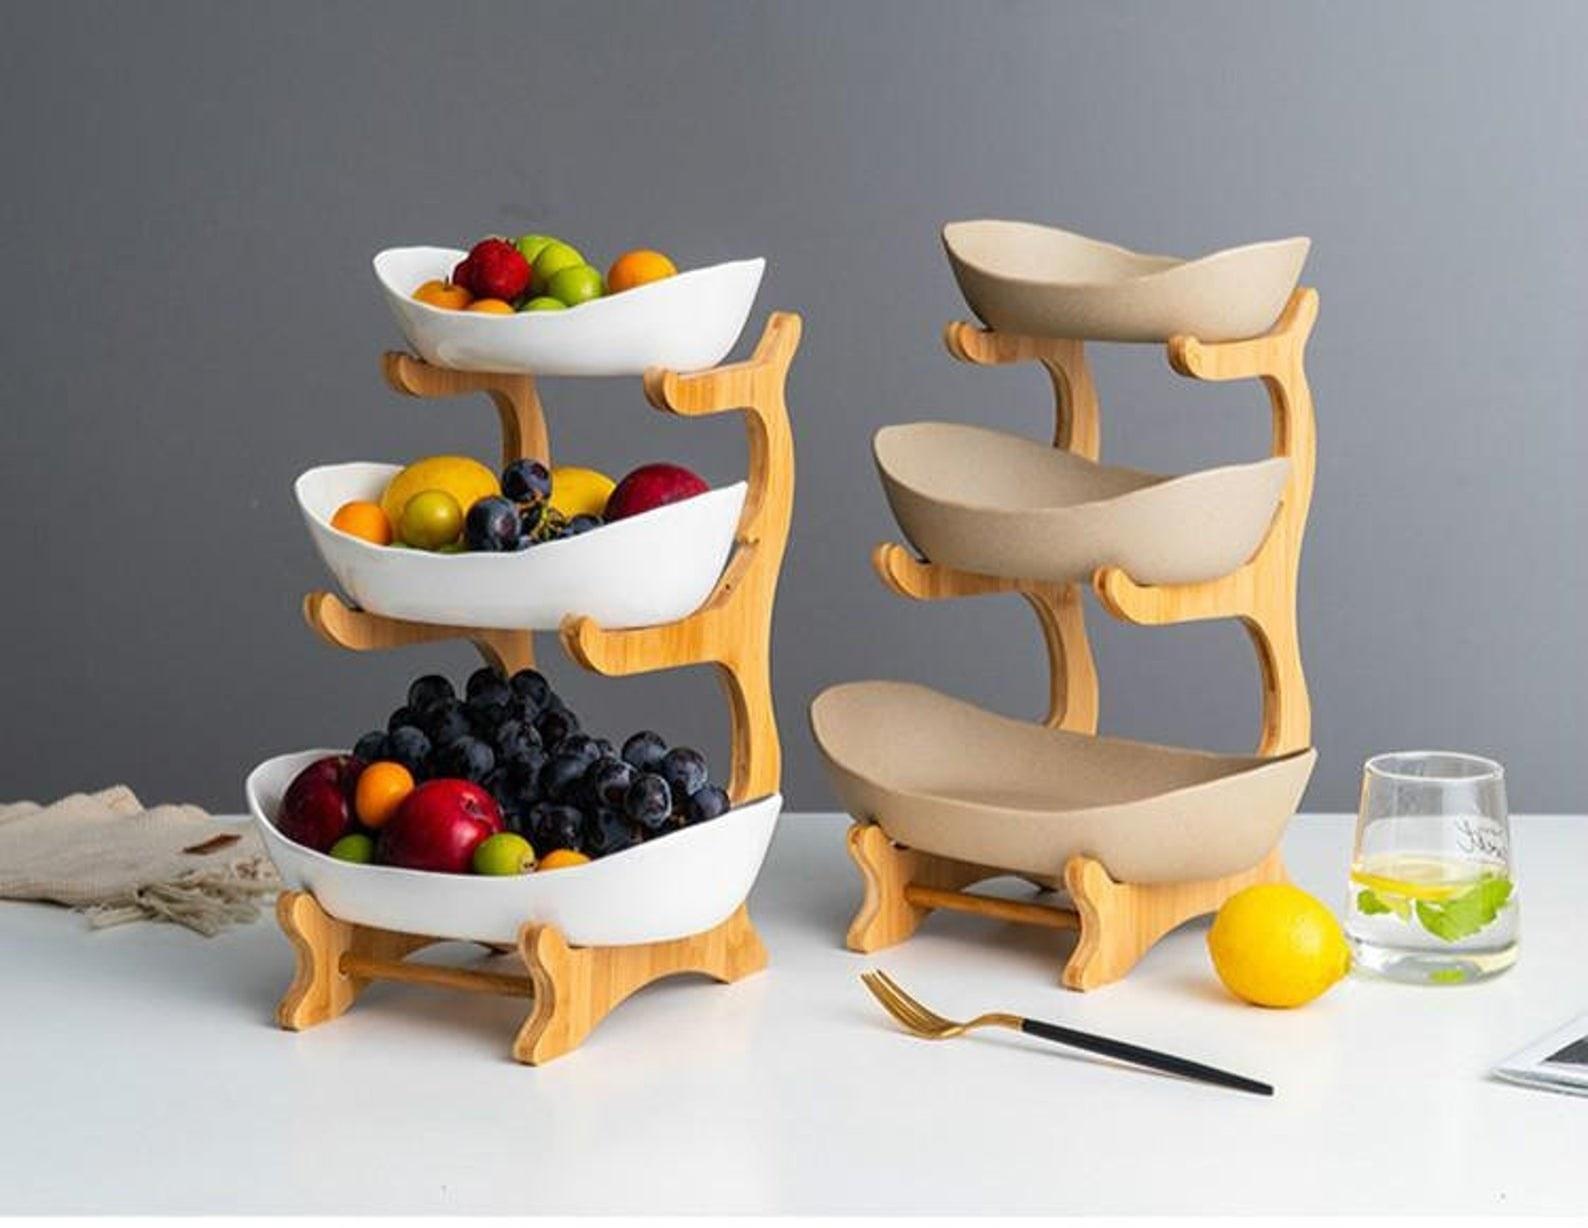 three tier holders of fruit bowls